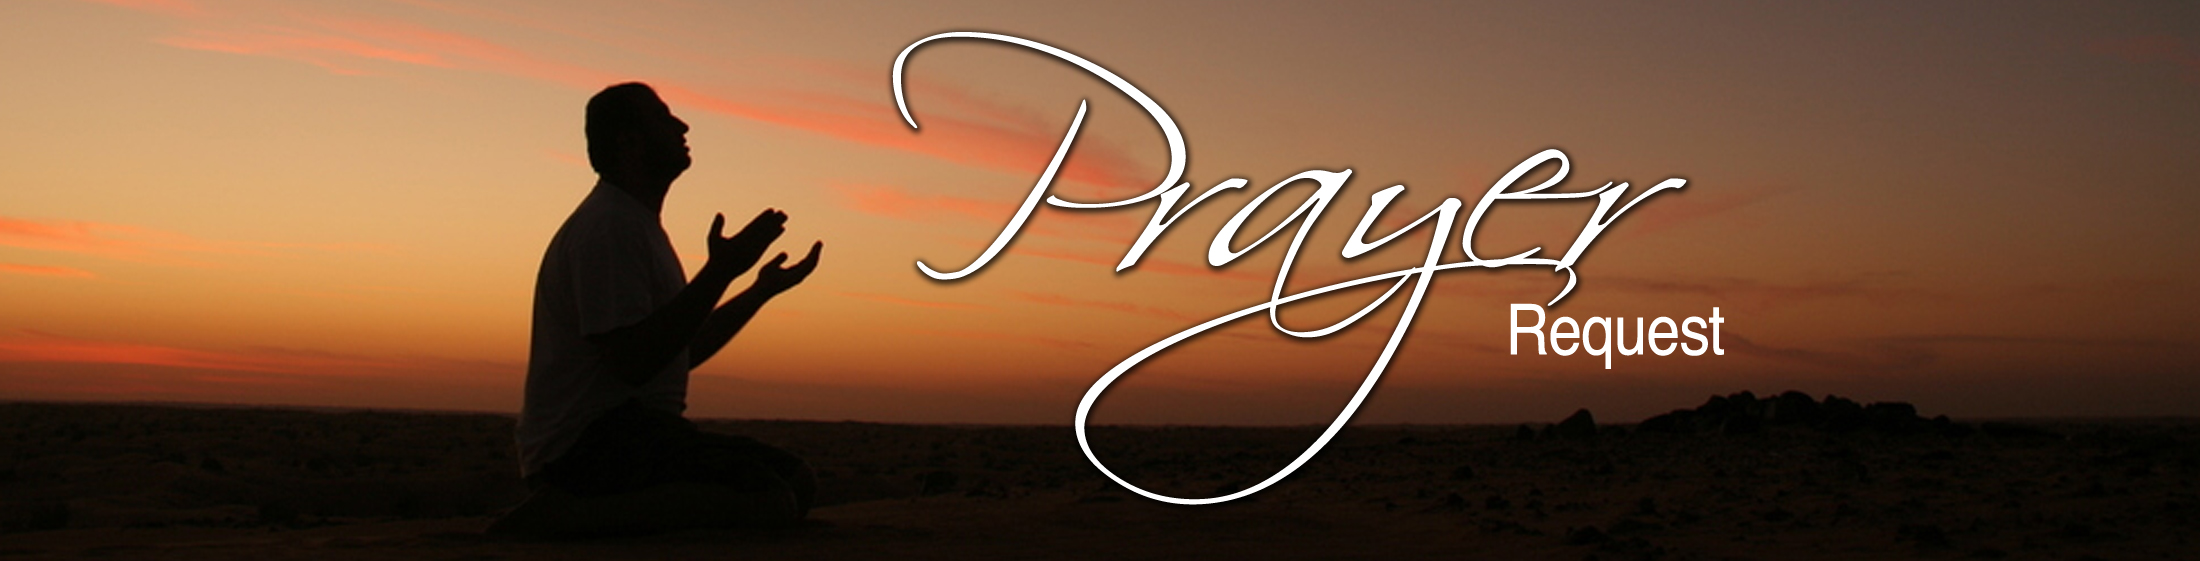 Prayer-RequestHeader.jpg